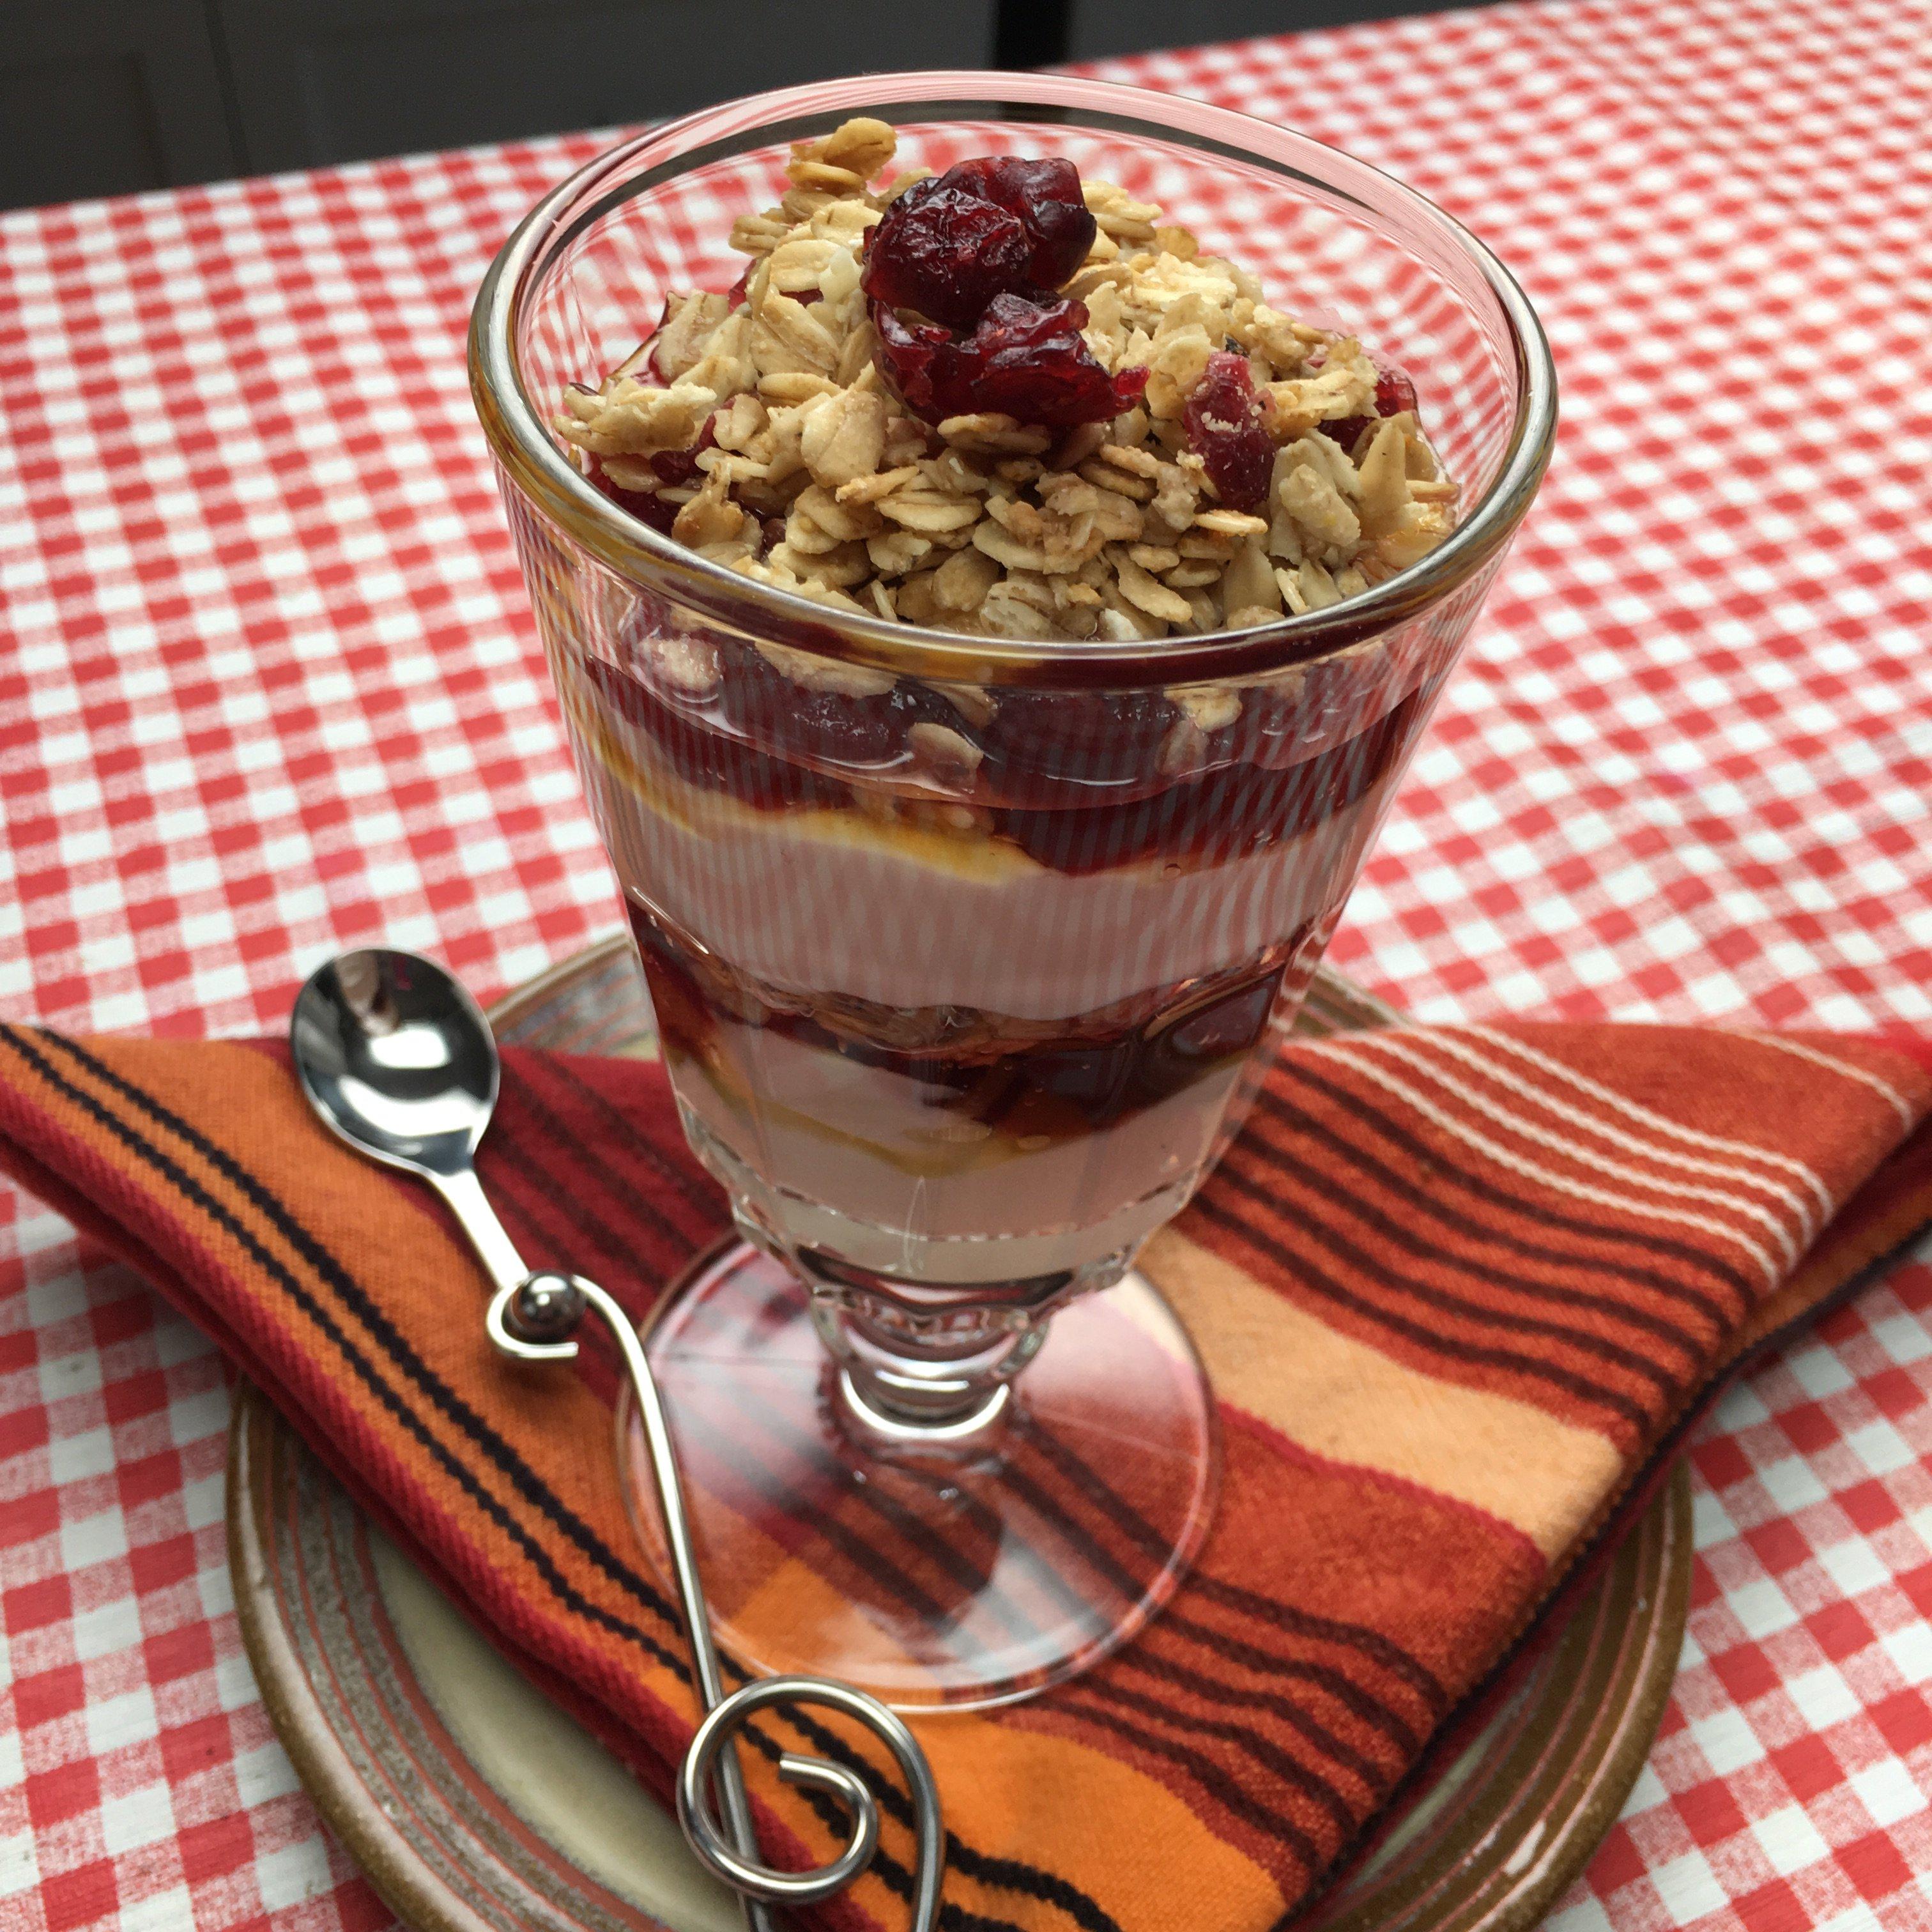 Cranberry Yogurt Parfait